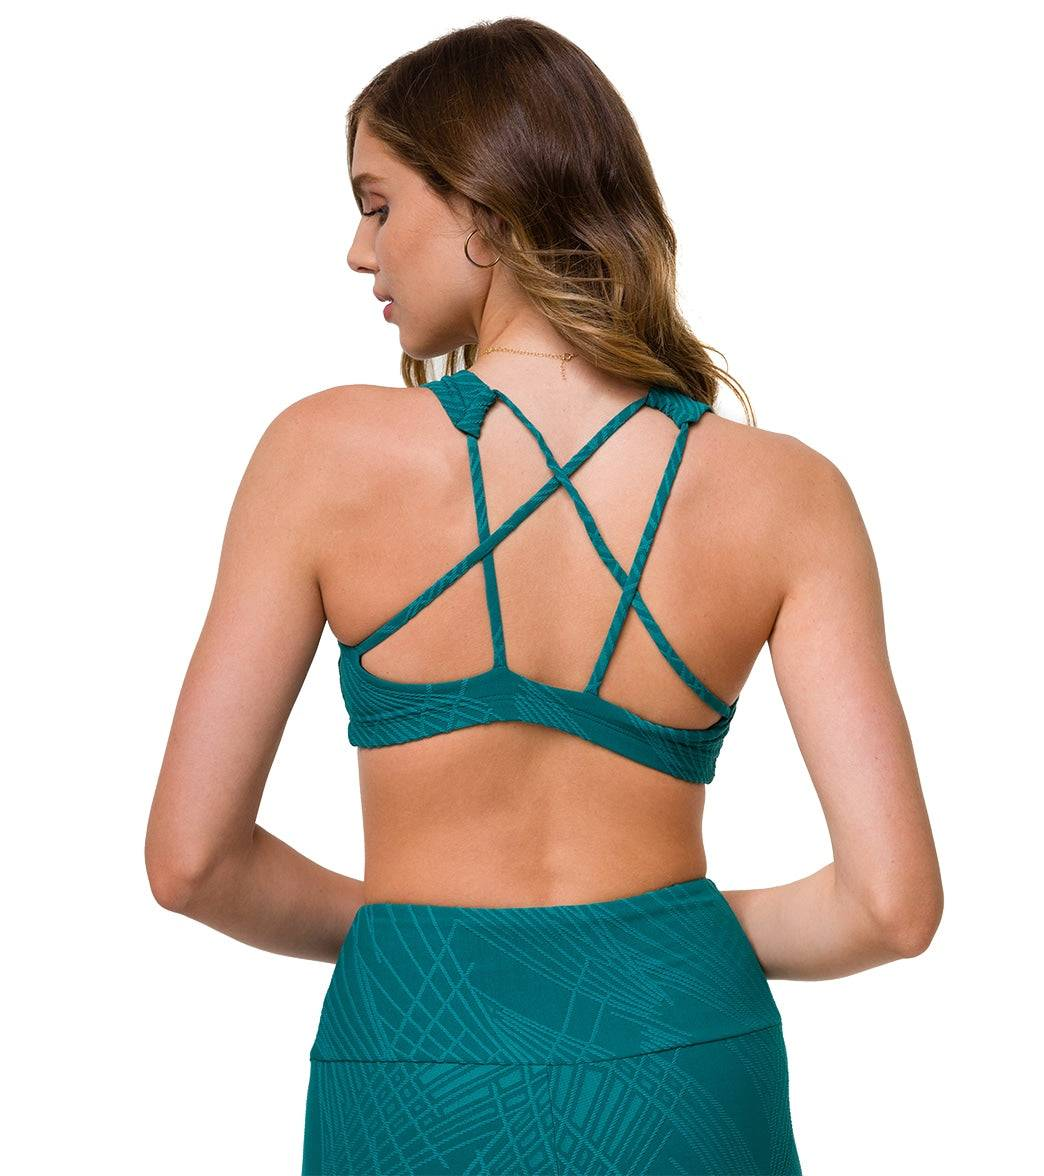 Onzie Women's Mudra Yoga Sports Bra - Teal Selenite LL Spandex